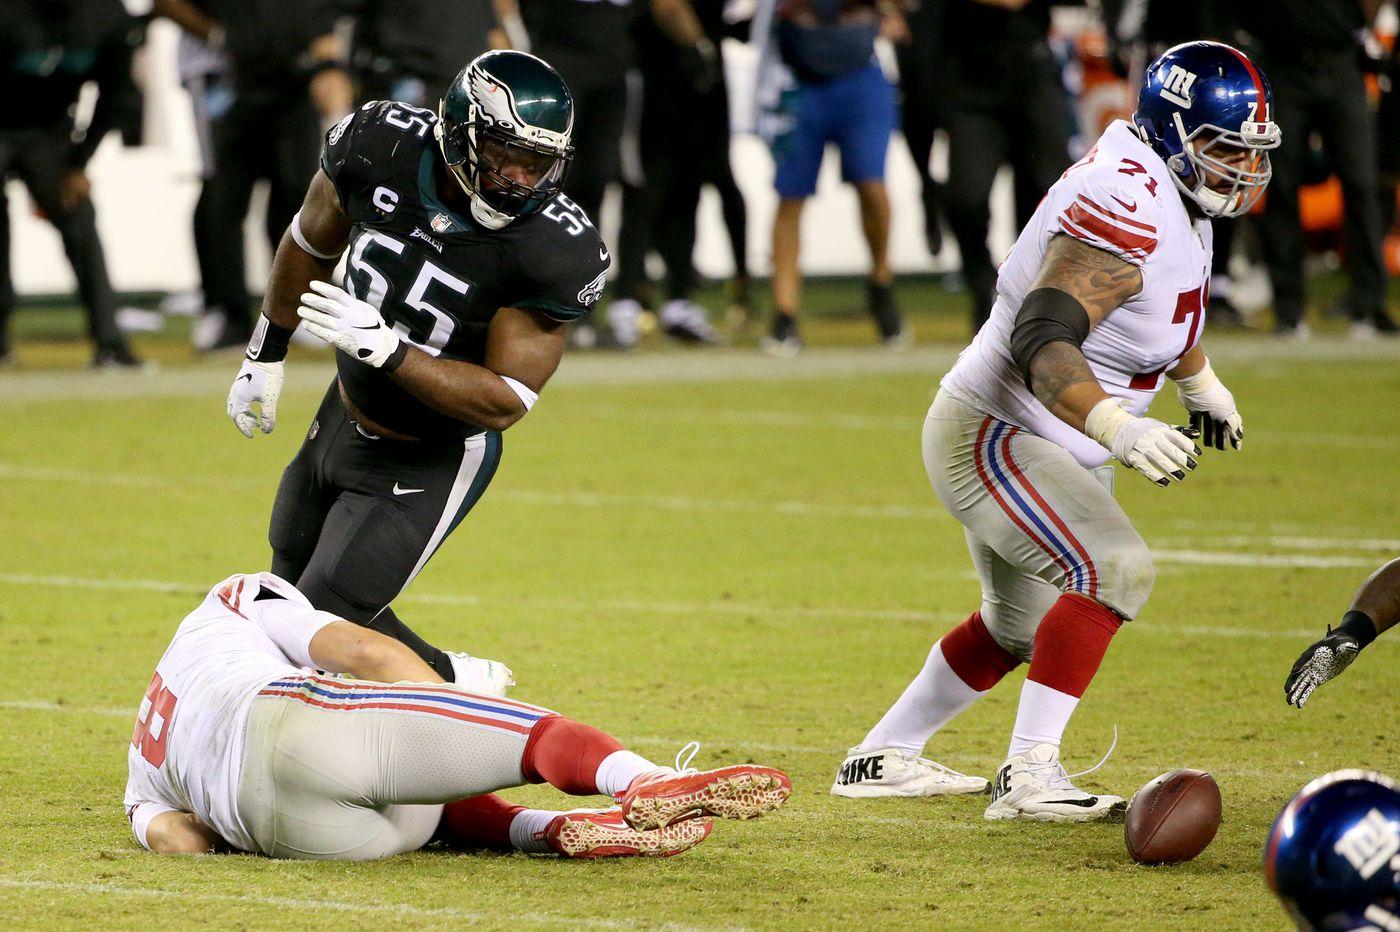 Eagles end Brandon Graham is finding quarterbacks less slippery this season